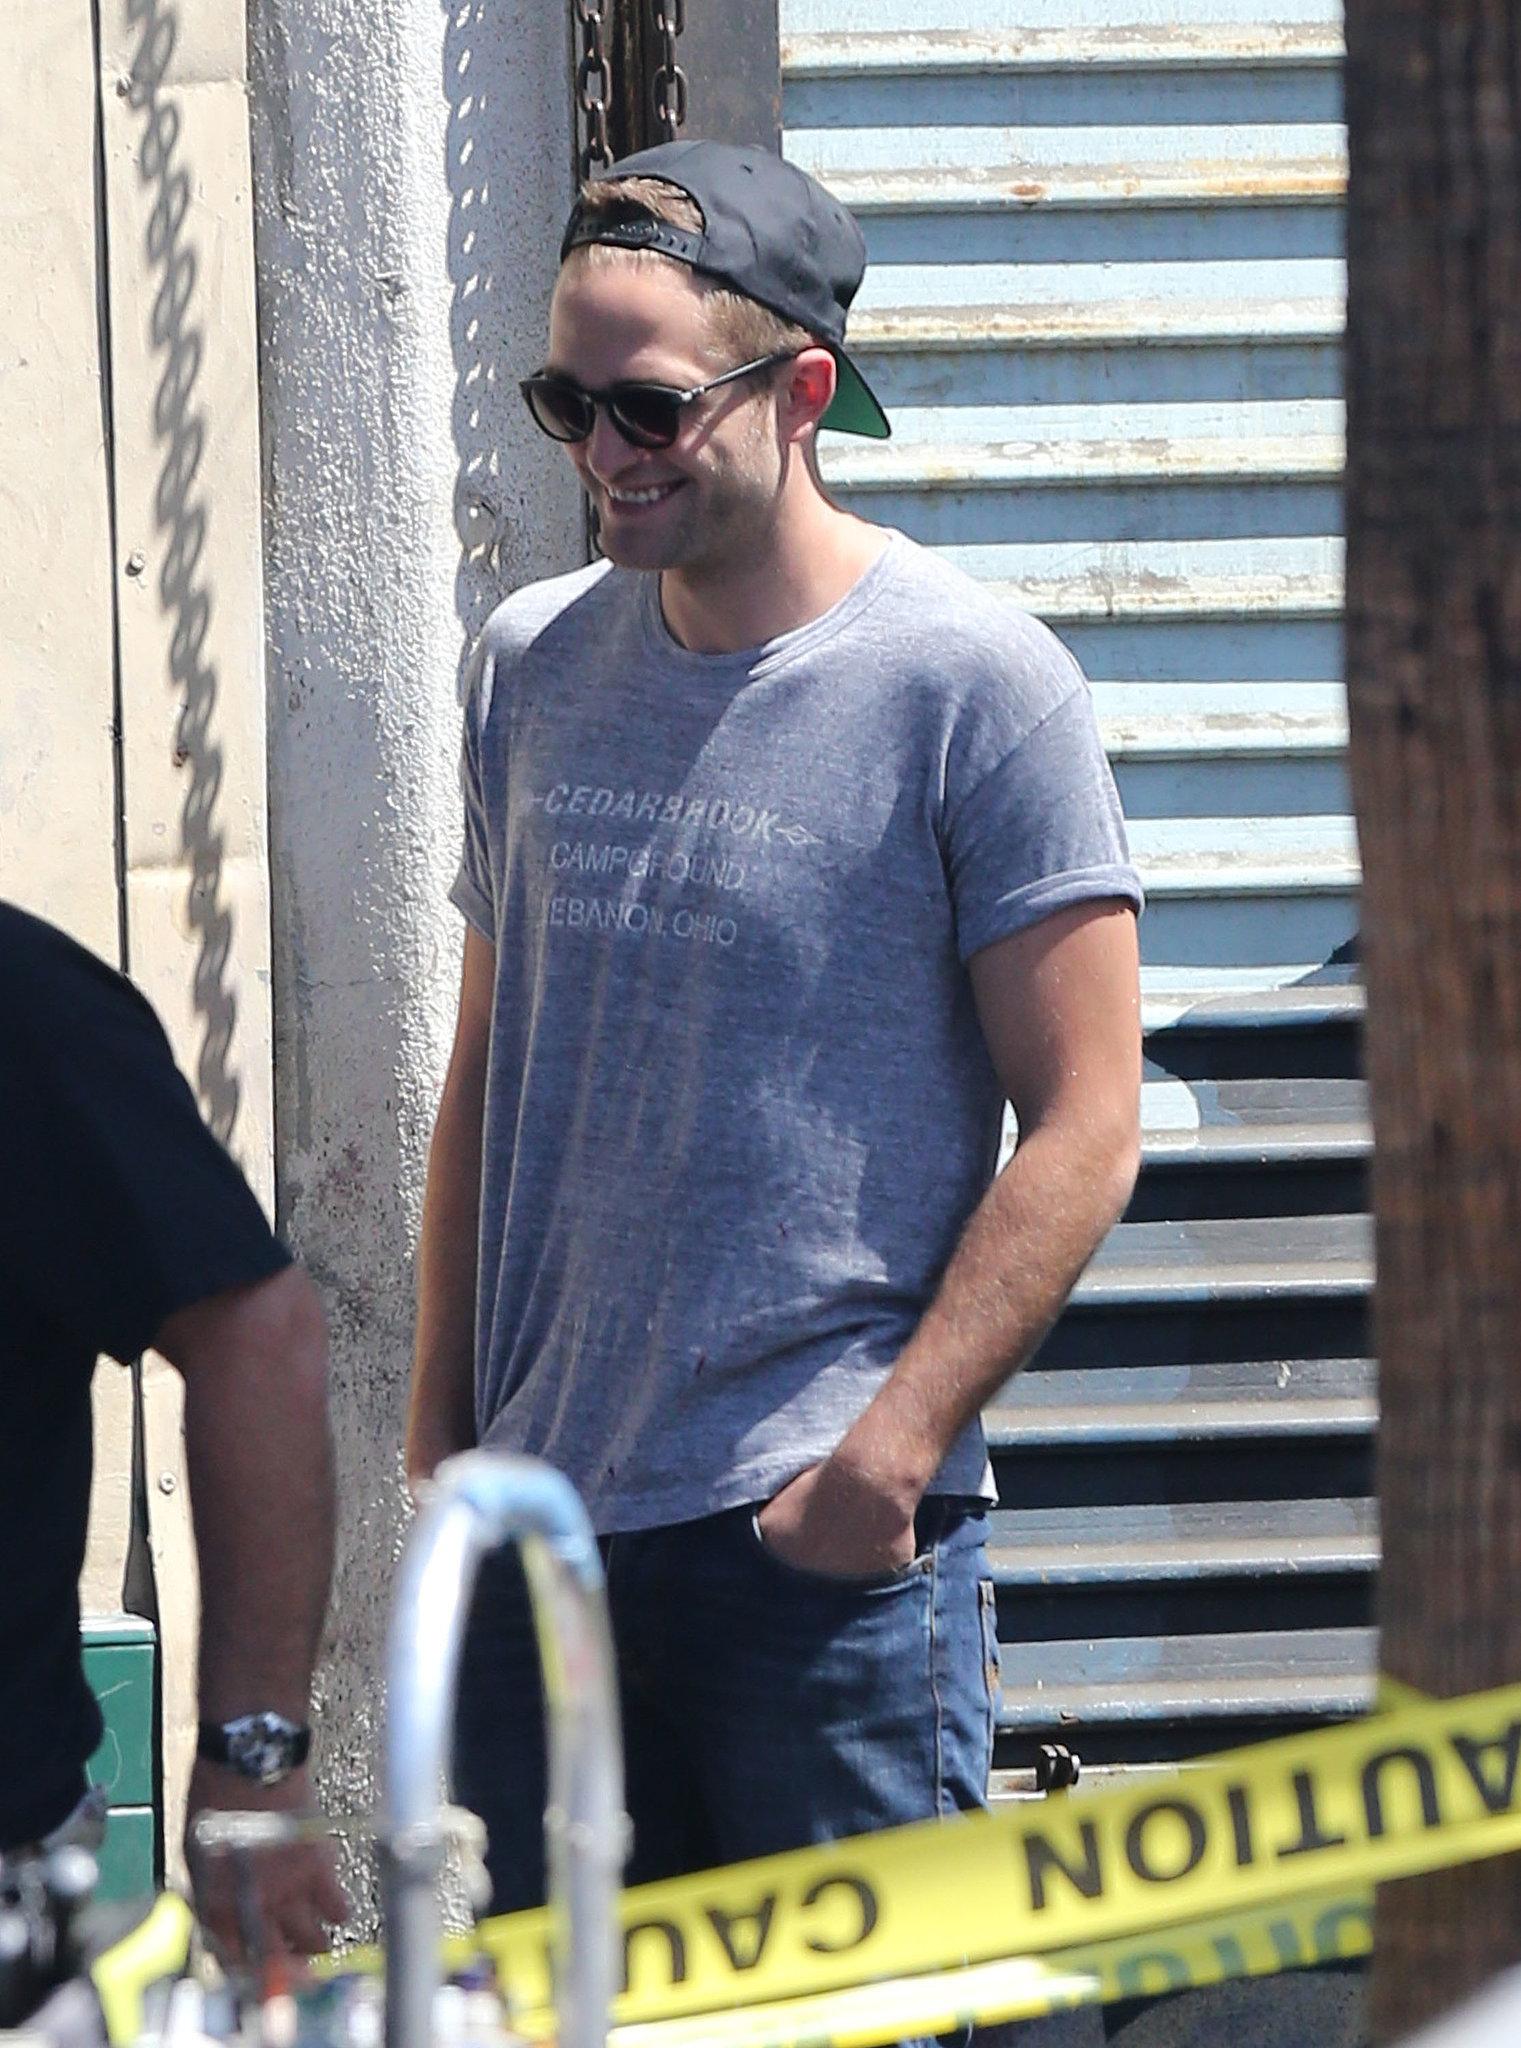 Robert Pattinson had a laugh on set.